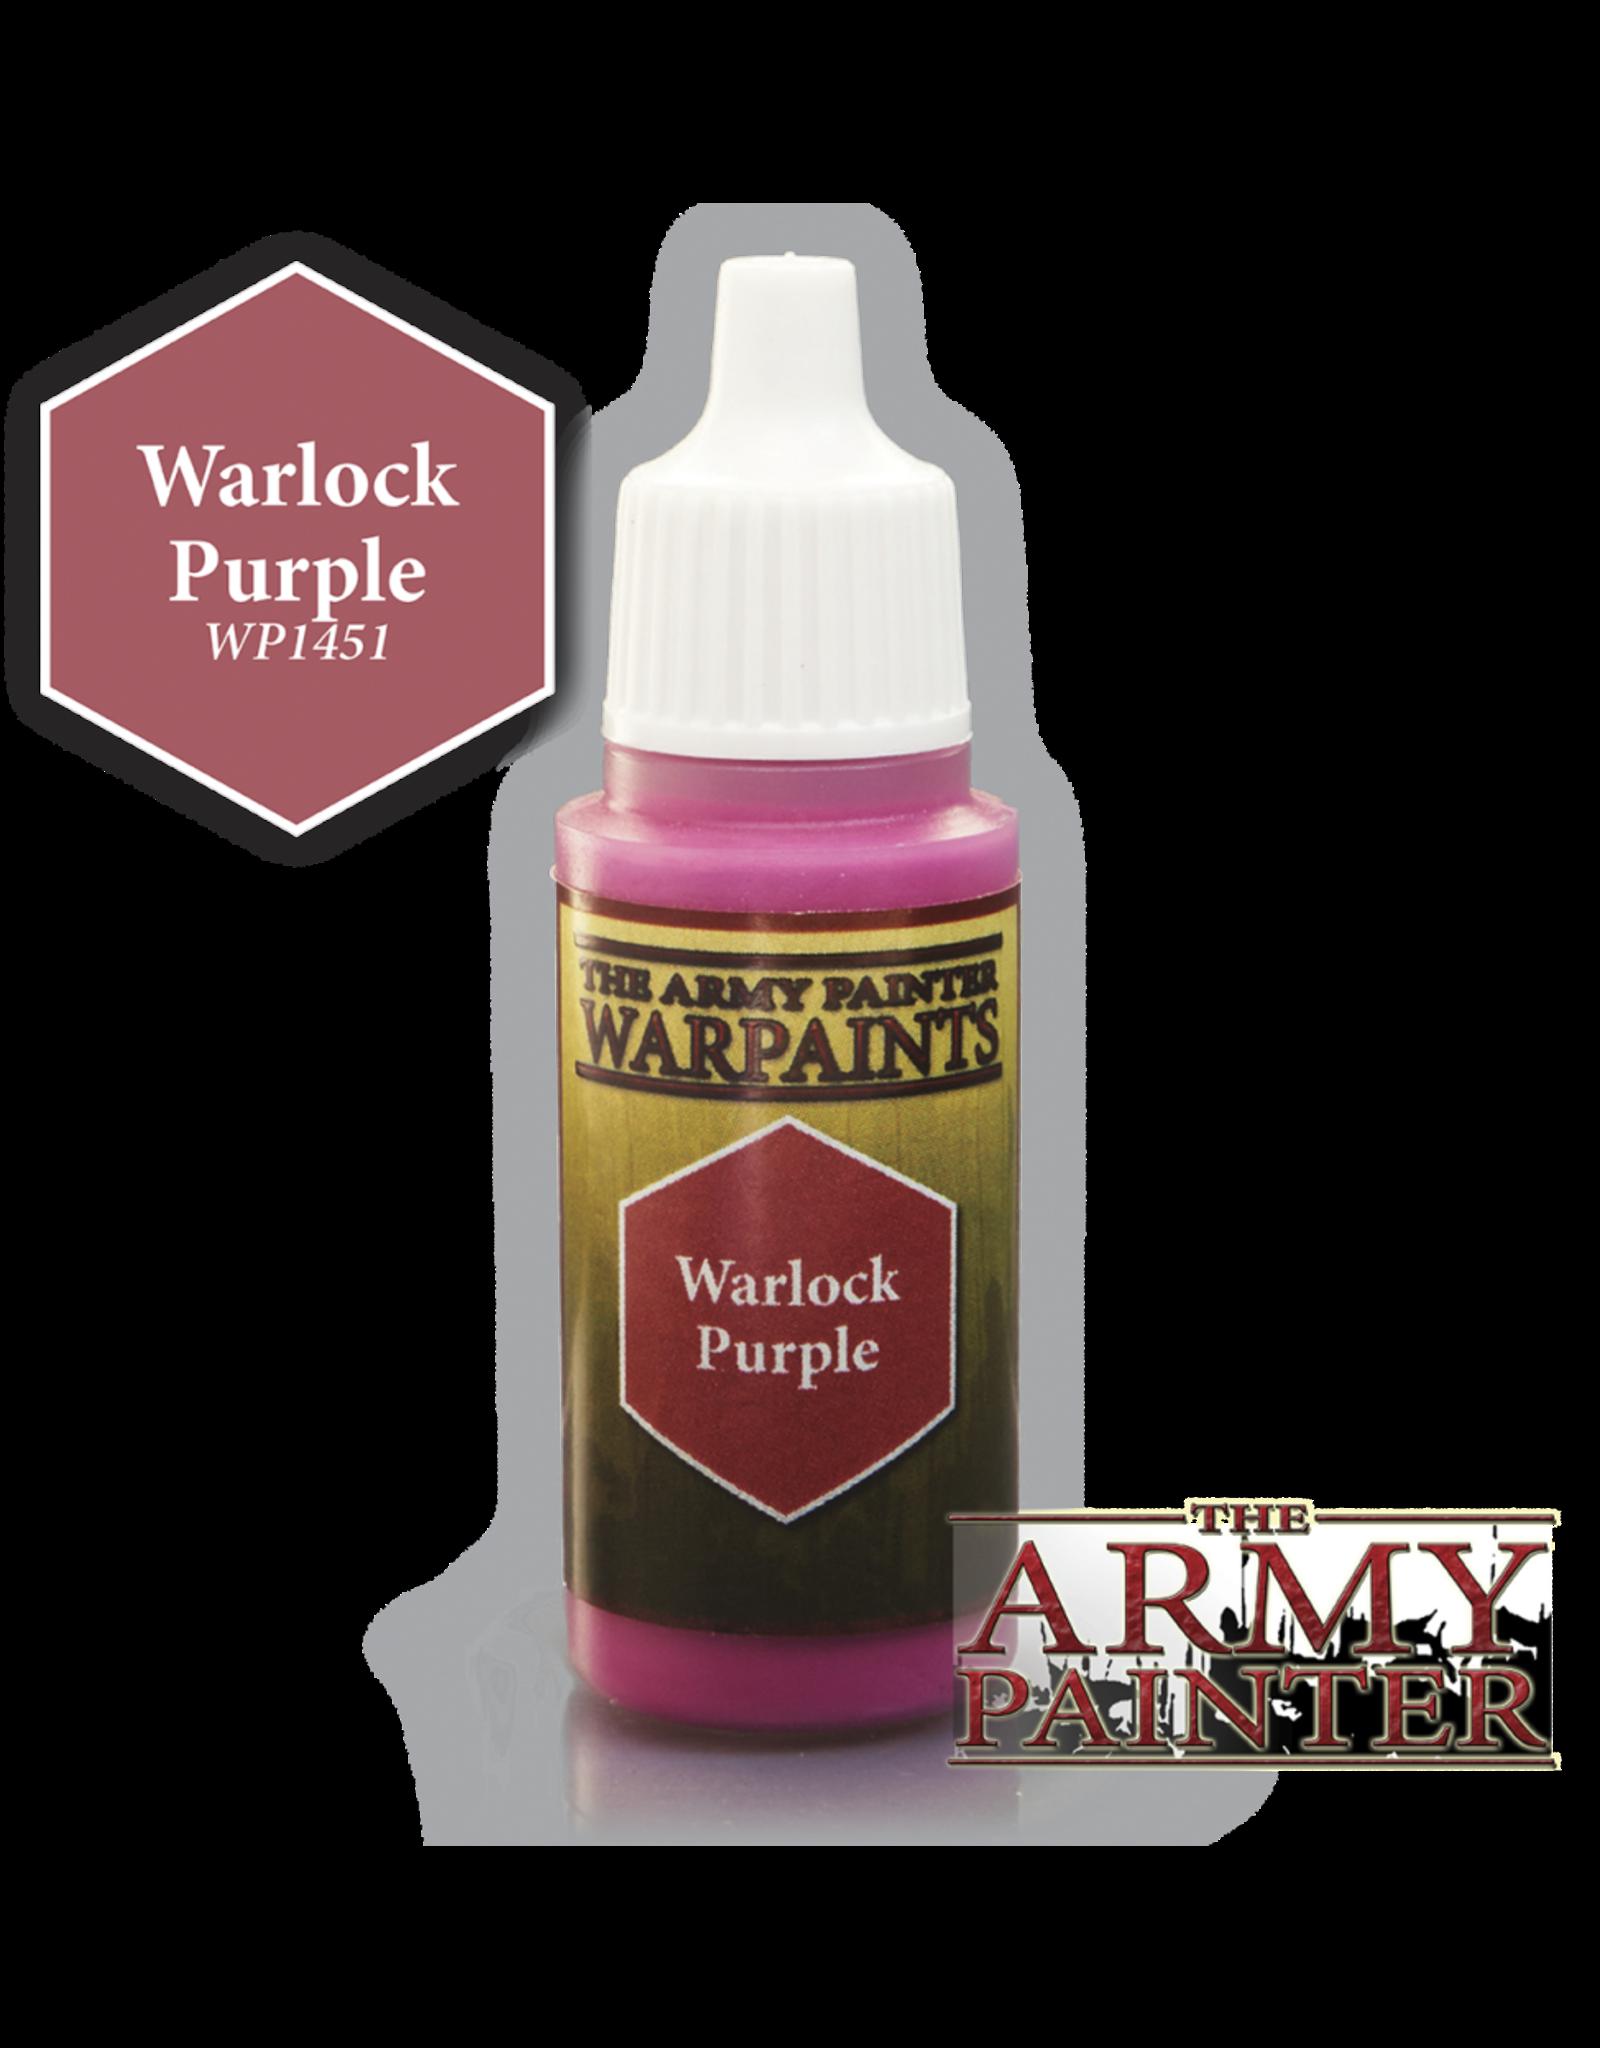 THE ARMY PAINTER ARMY PAINTER WARPAINTS WARLOCK PURPLE